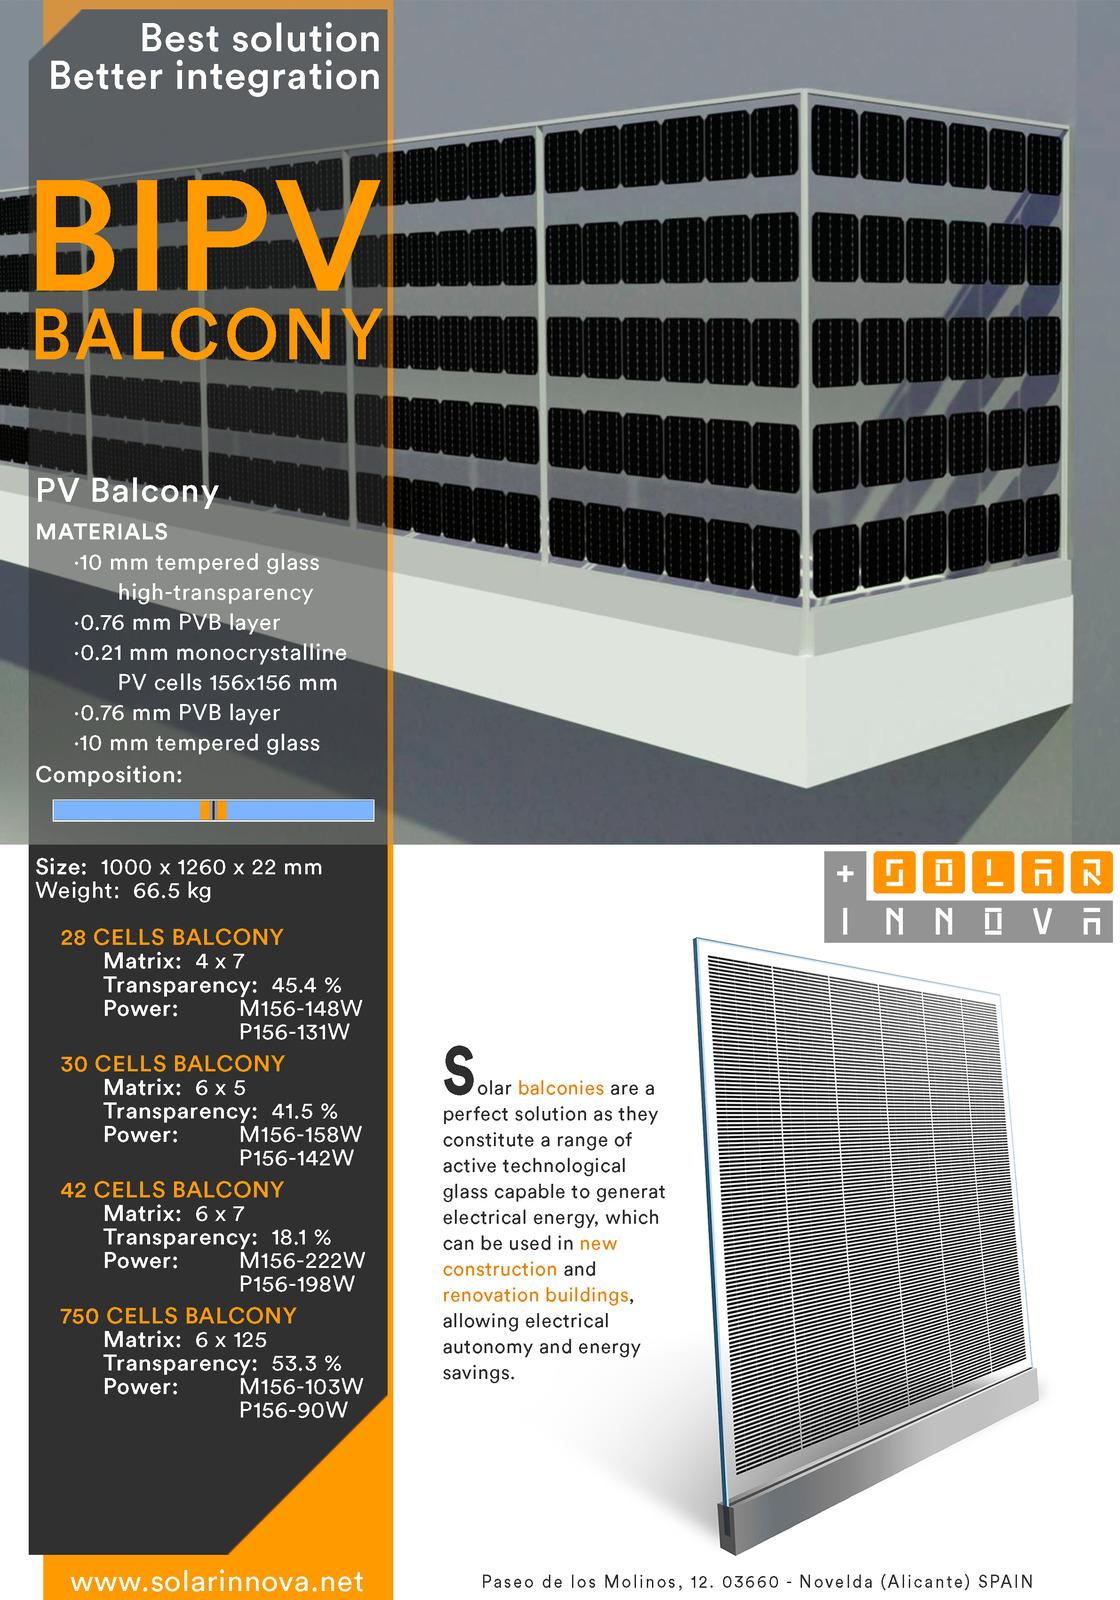 https://solarinnova.pl/wp-content/uploads/2021/04/katalog-2021-bipv-balkony-en_Strona_1.com_.jpg